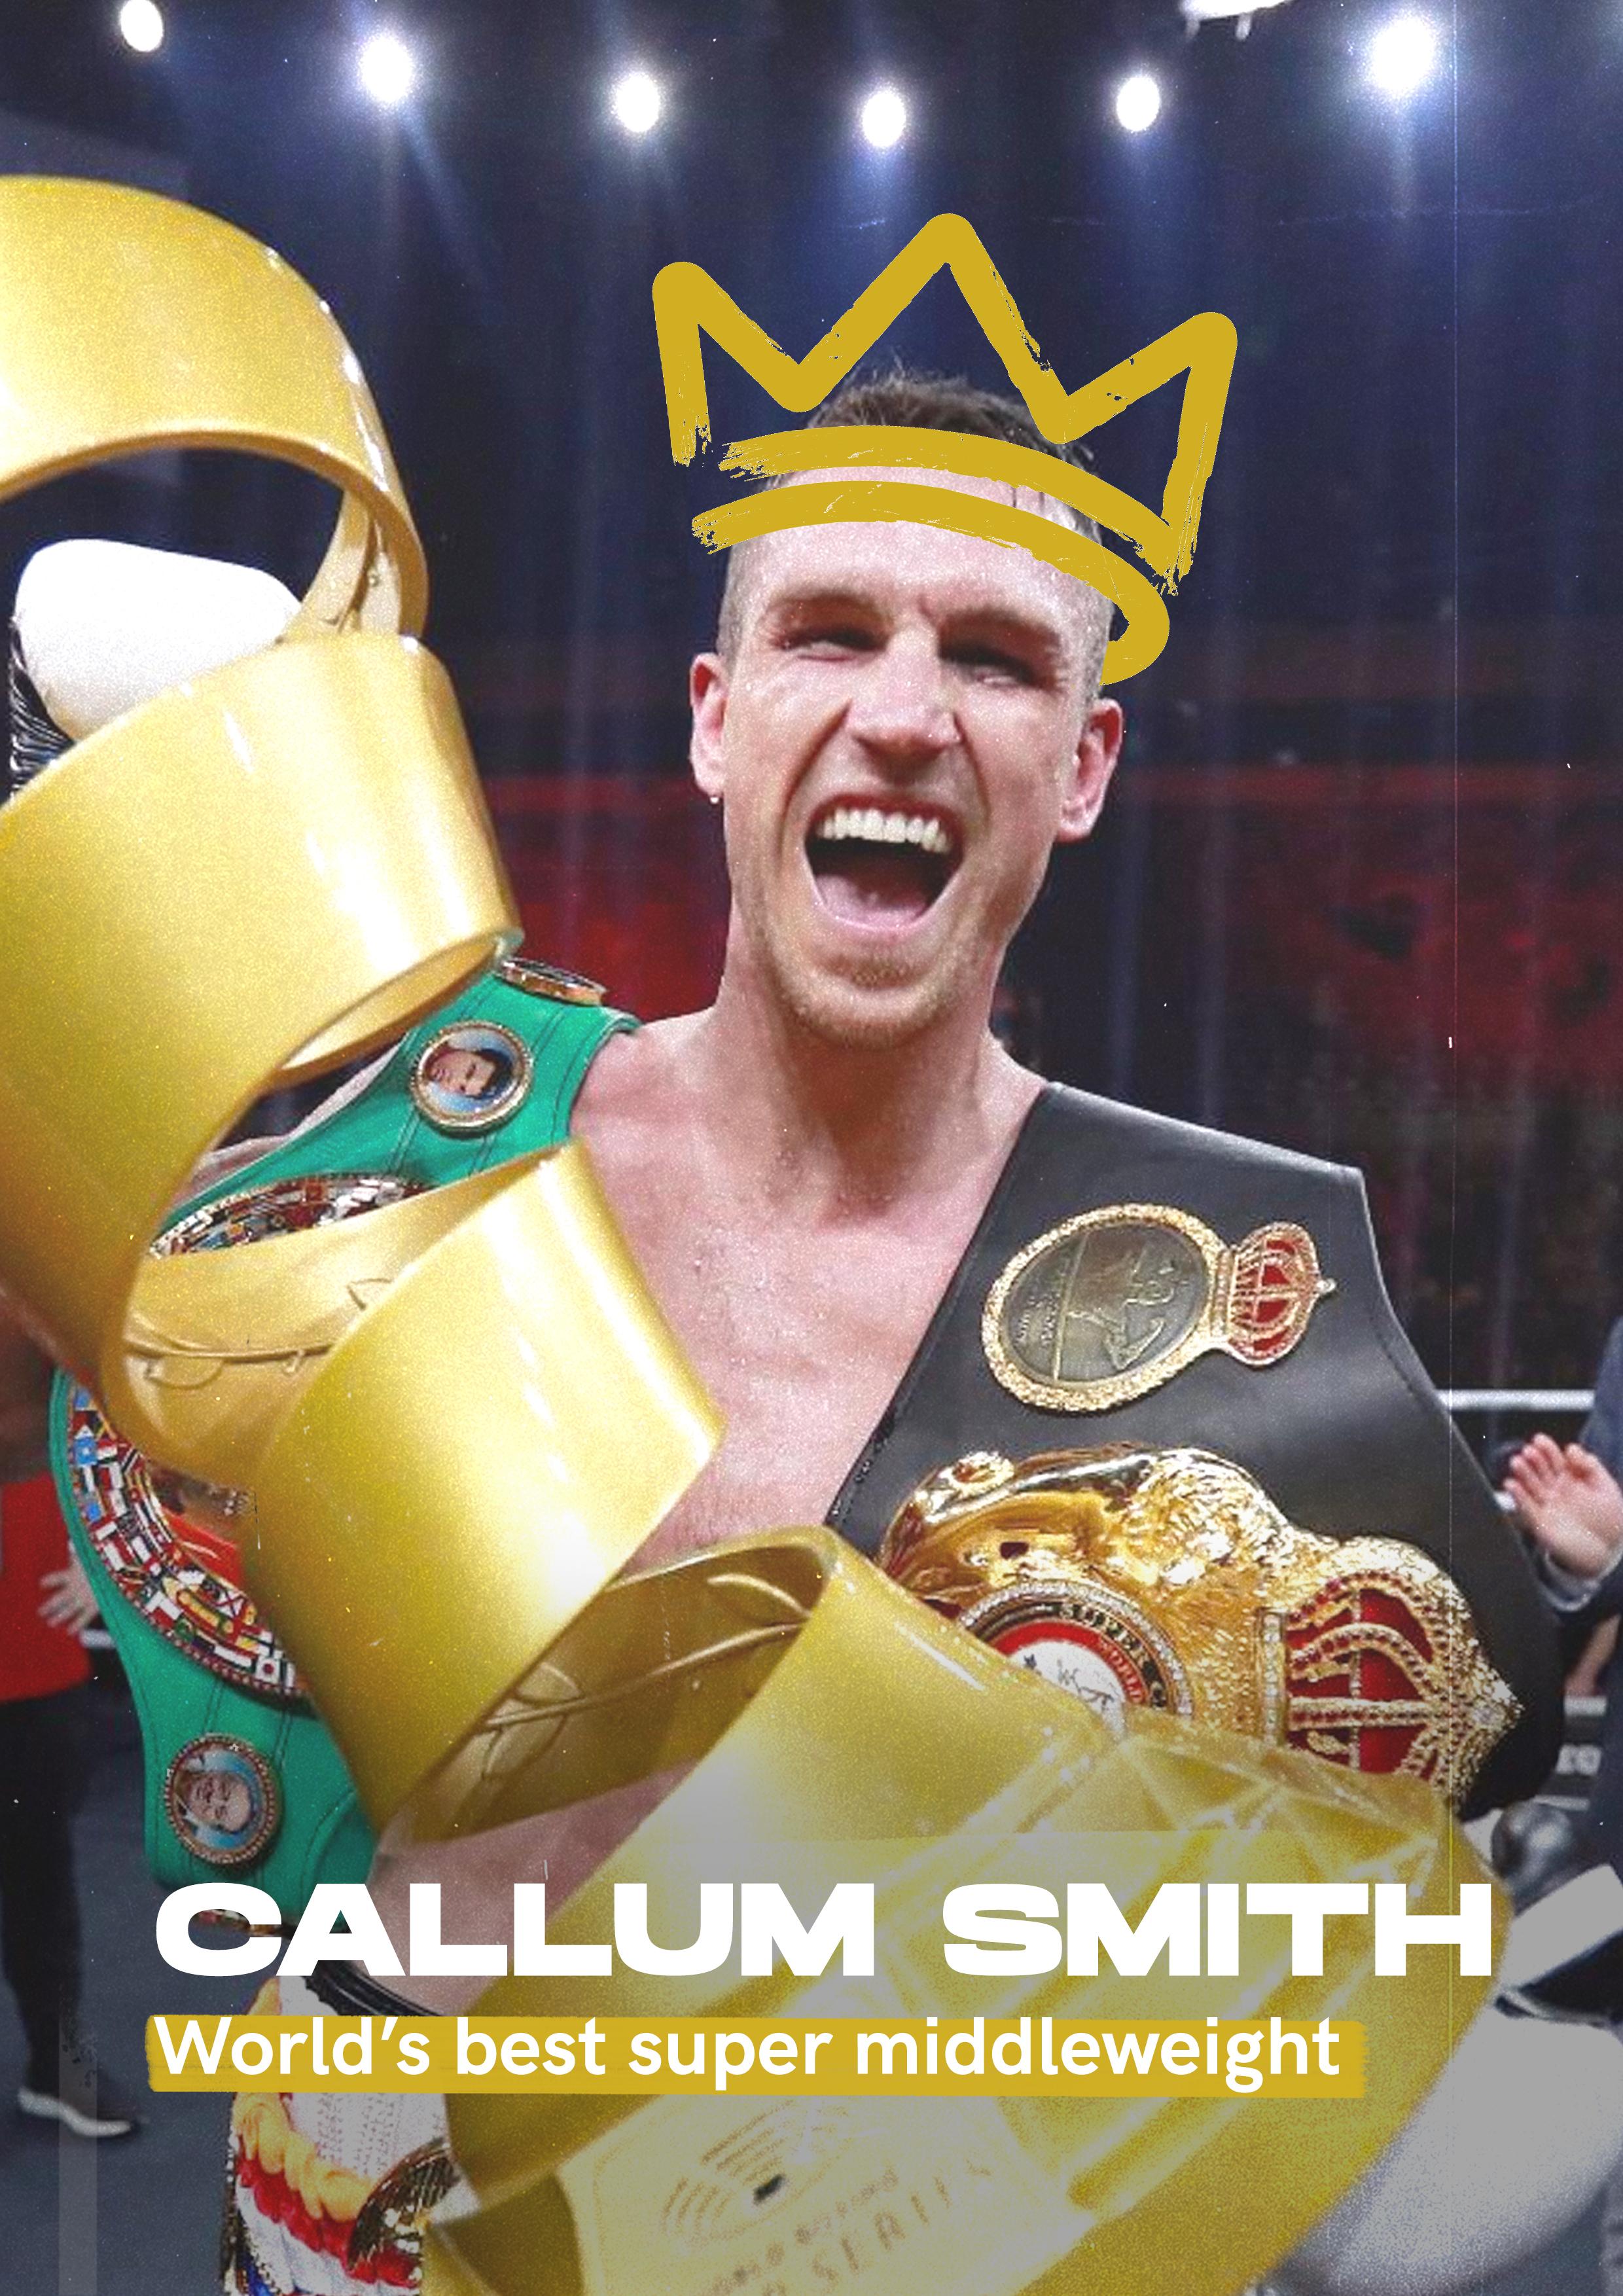 STN Sports: campaign features Callum Smith